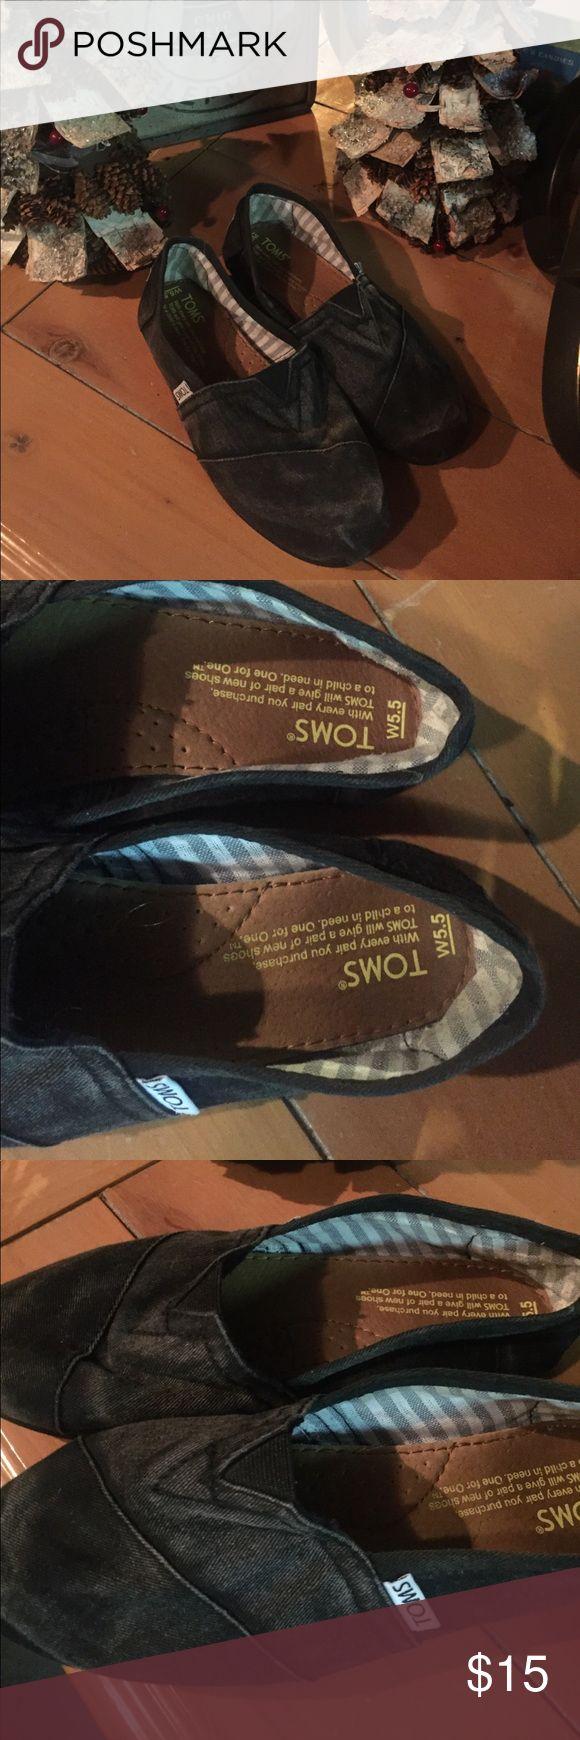 Toms stone wash 5.5 Excellent. Fantastic preloved Sz 5.5  black stone wash TOMS Shoes Flats & Loafers